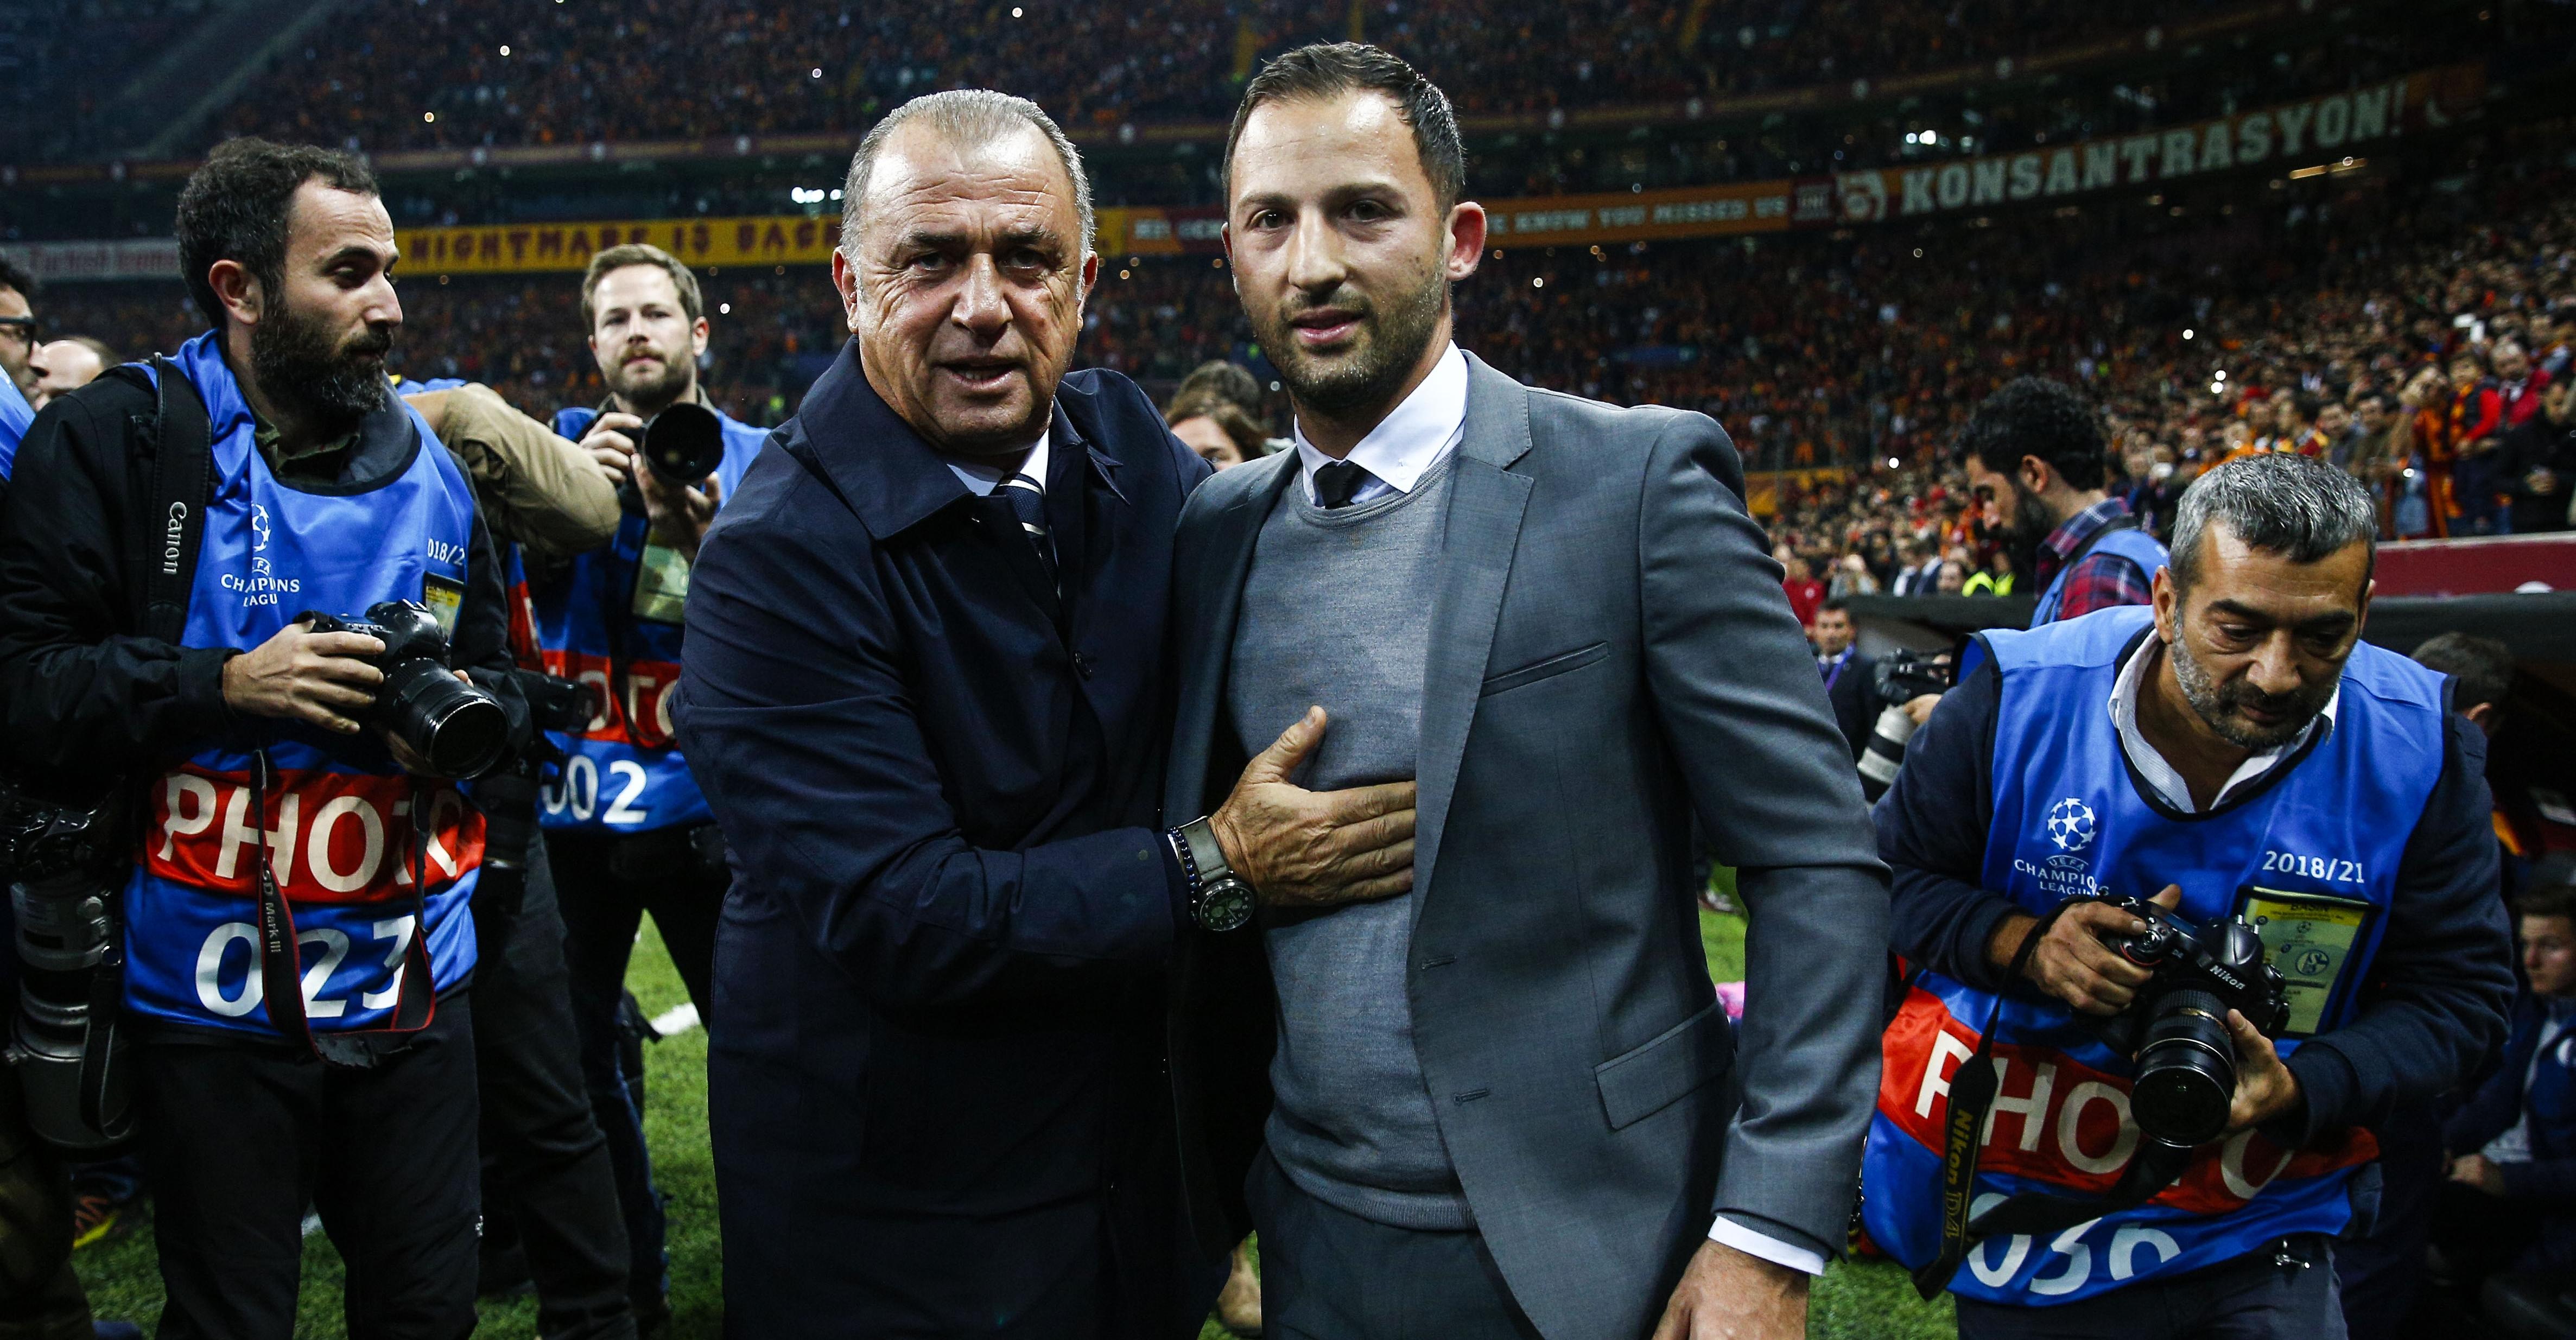 Fatih Terim Domenico Tedesco Galatasaray Schalke 04 Champions League 10/24/18